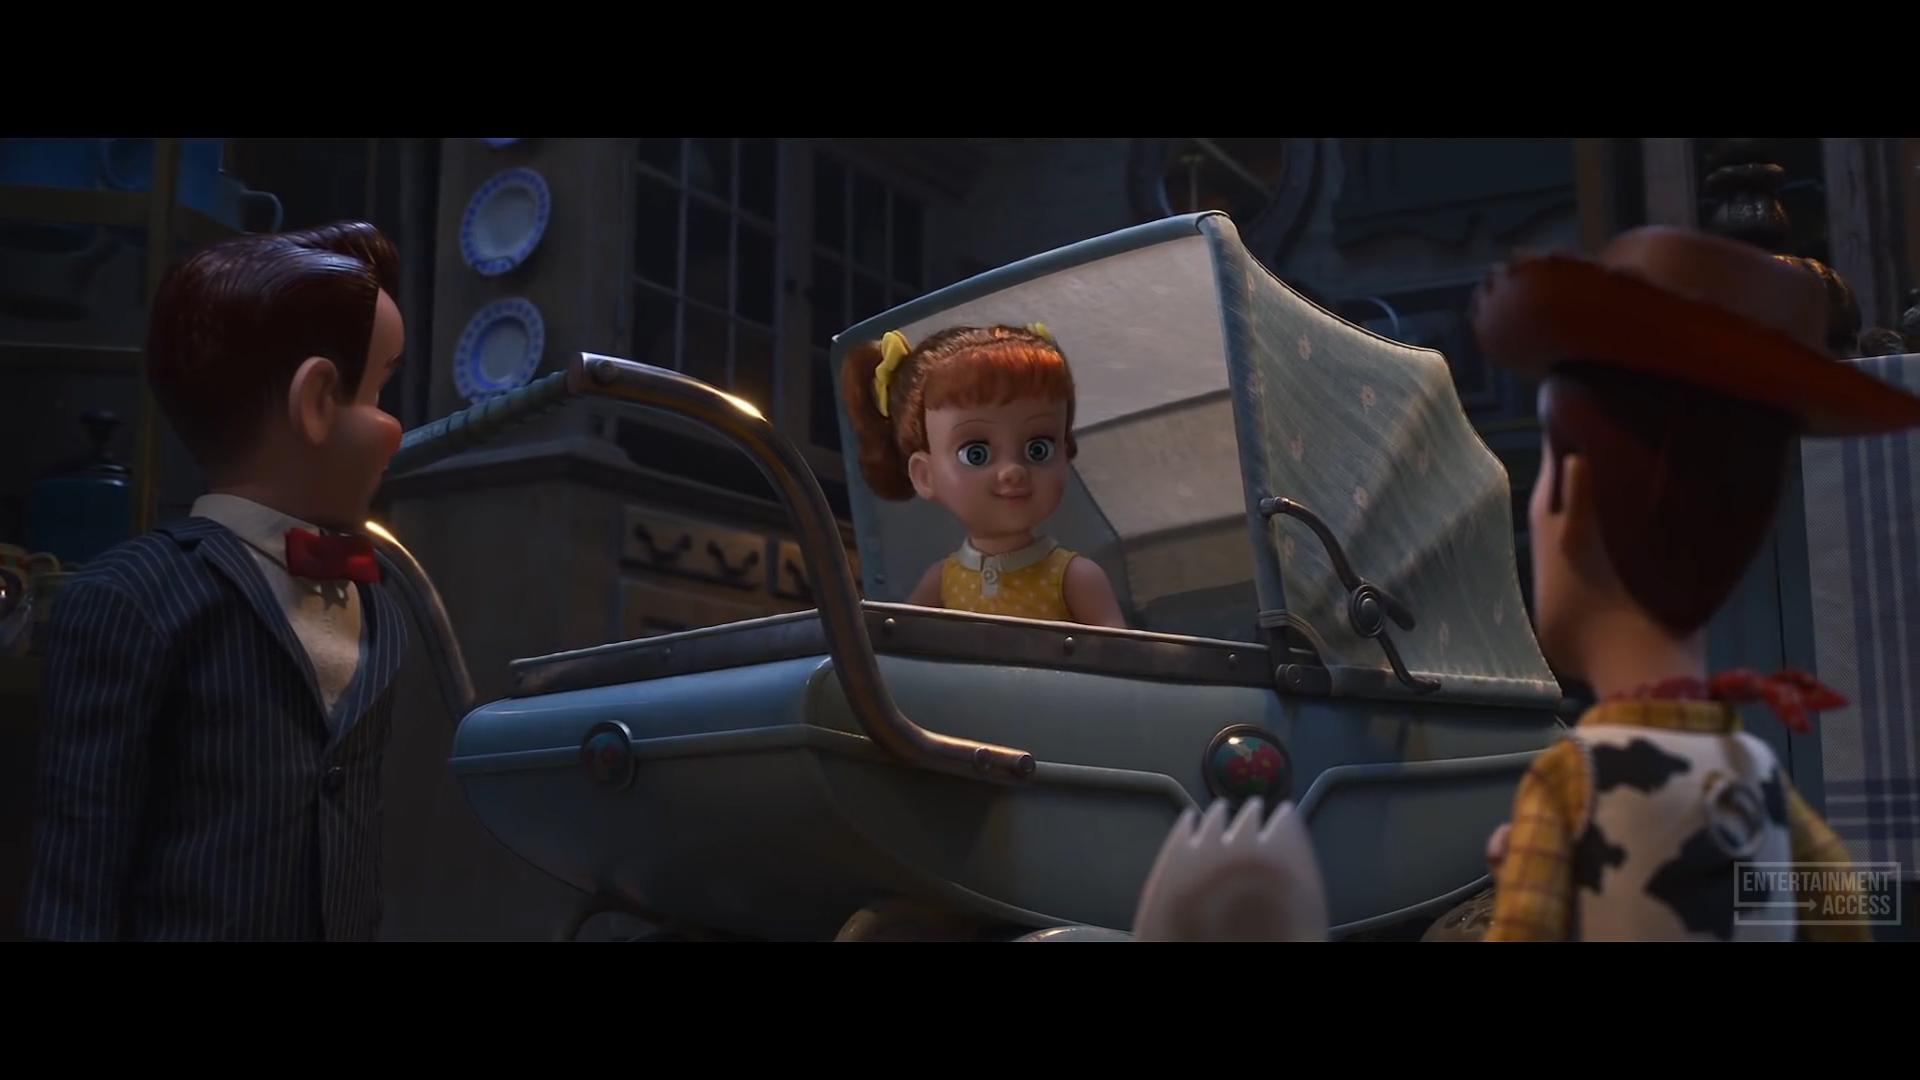 Toy Story 4 - Gabby Gabby and Benson